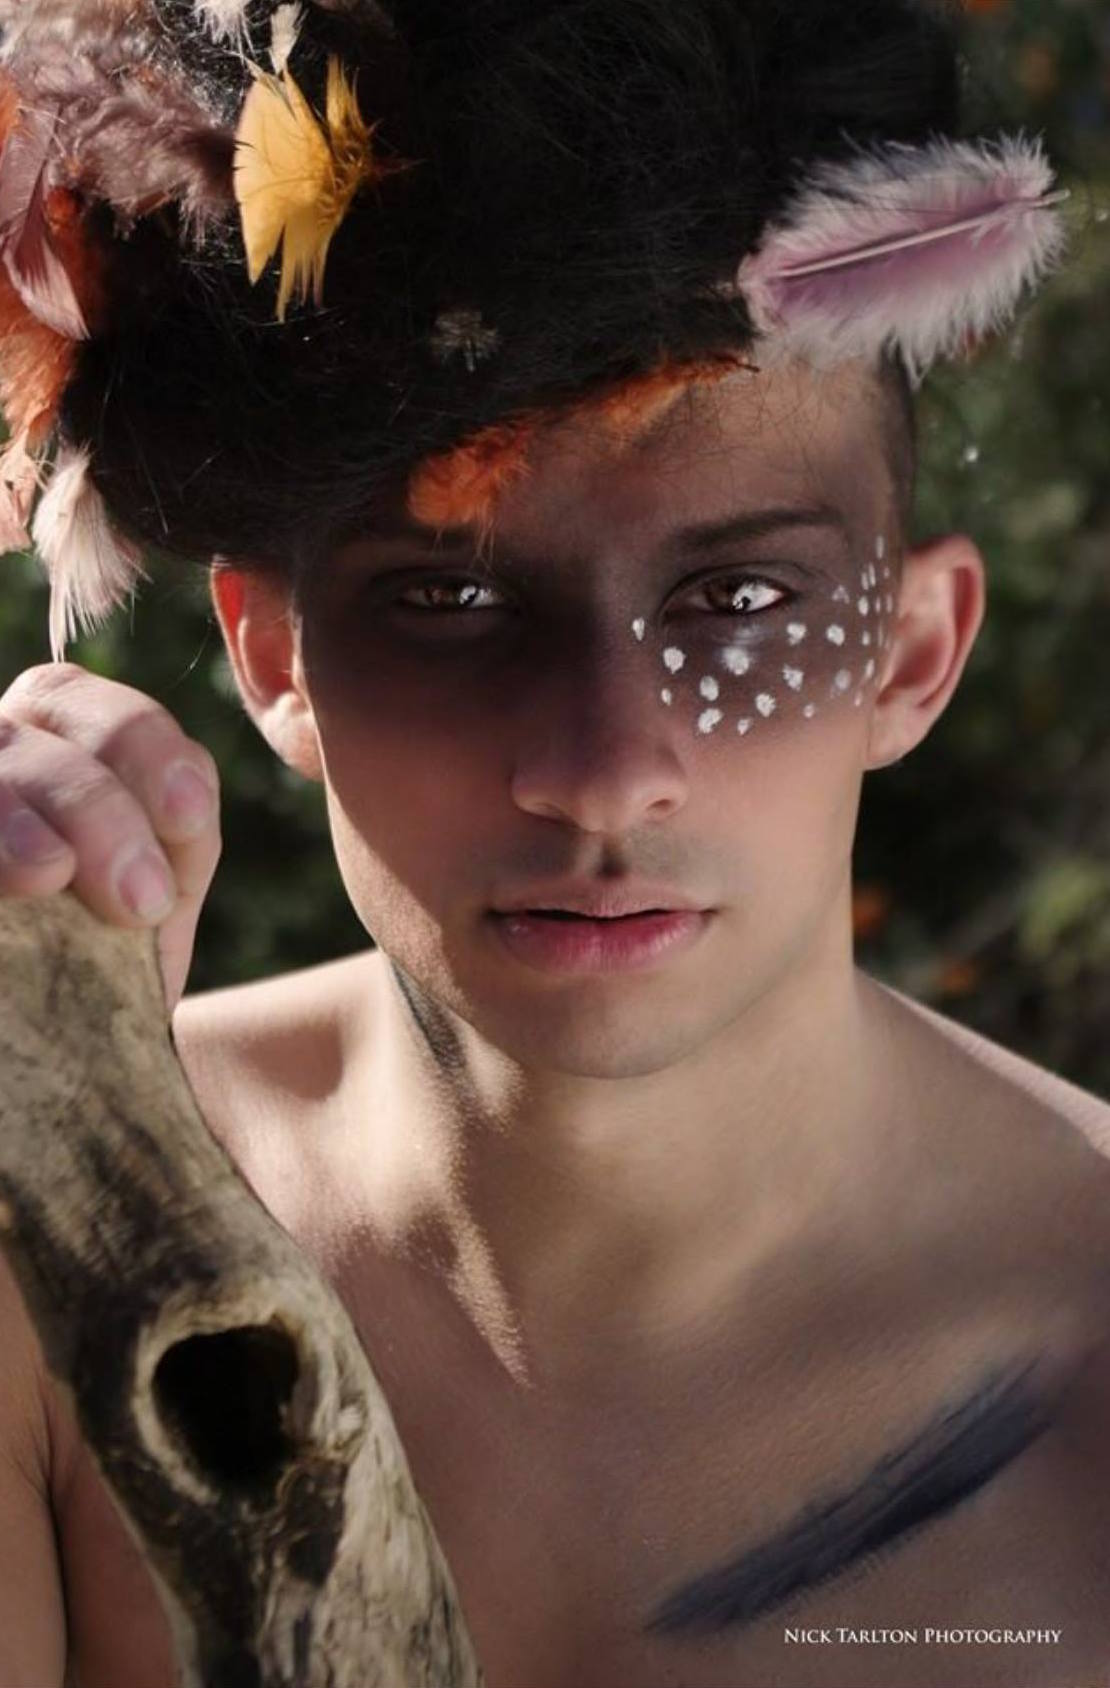 Ayden Andrews Lareese - Photo by Nick Tarlton Photography